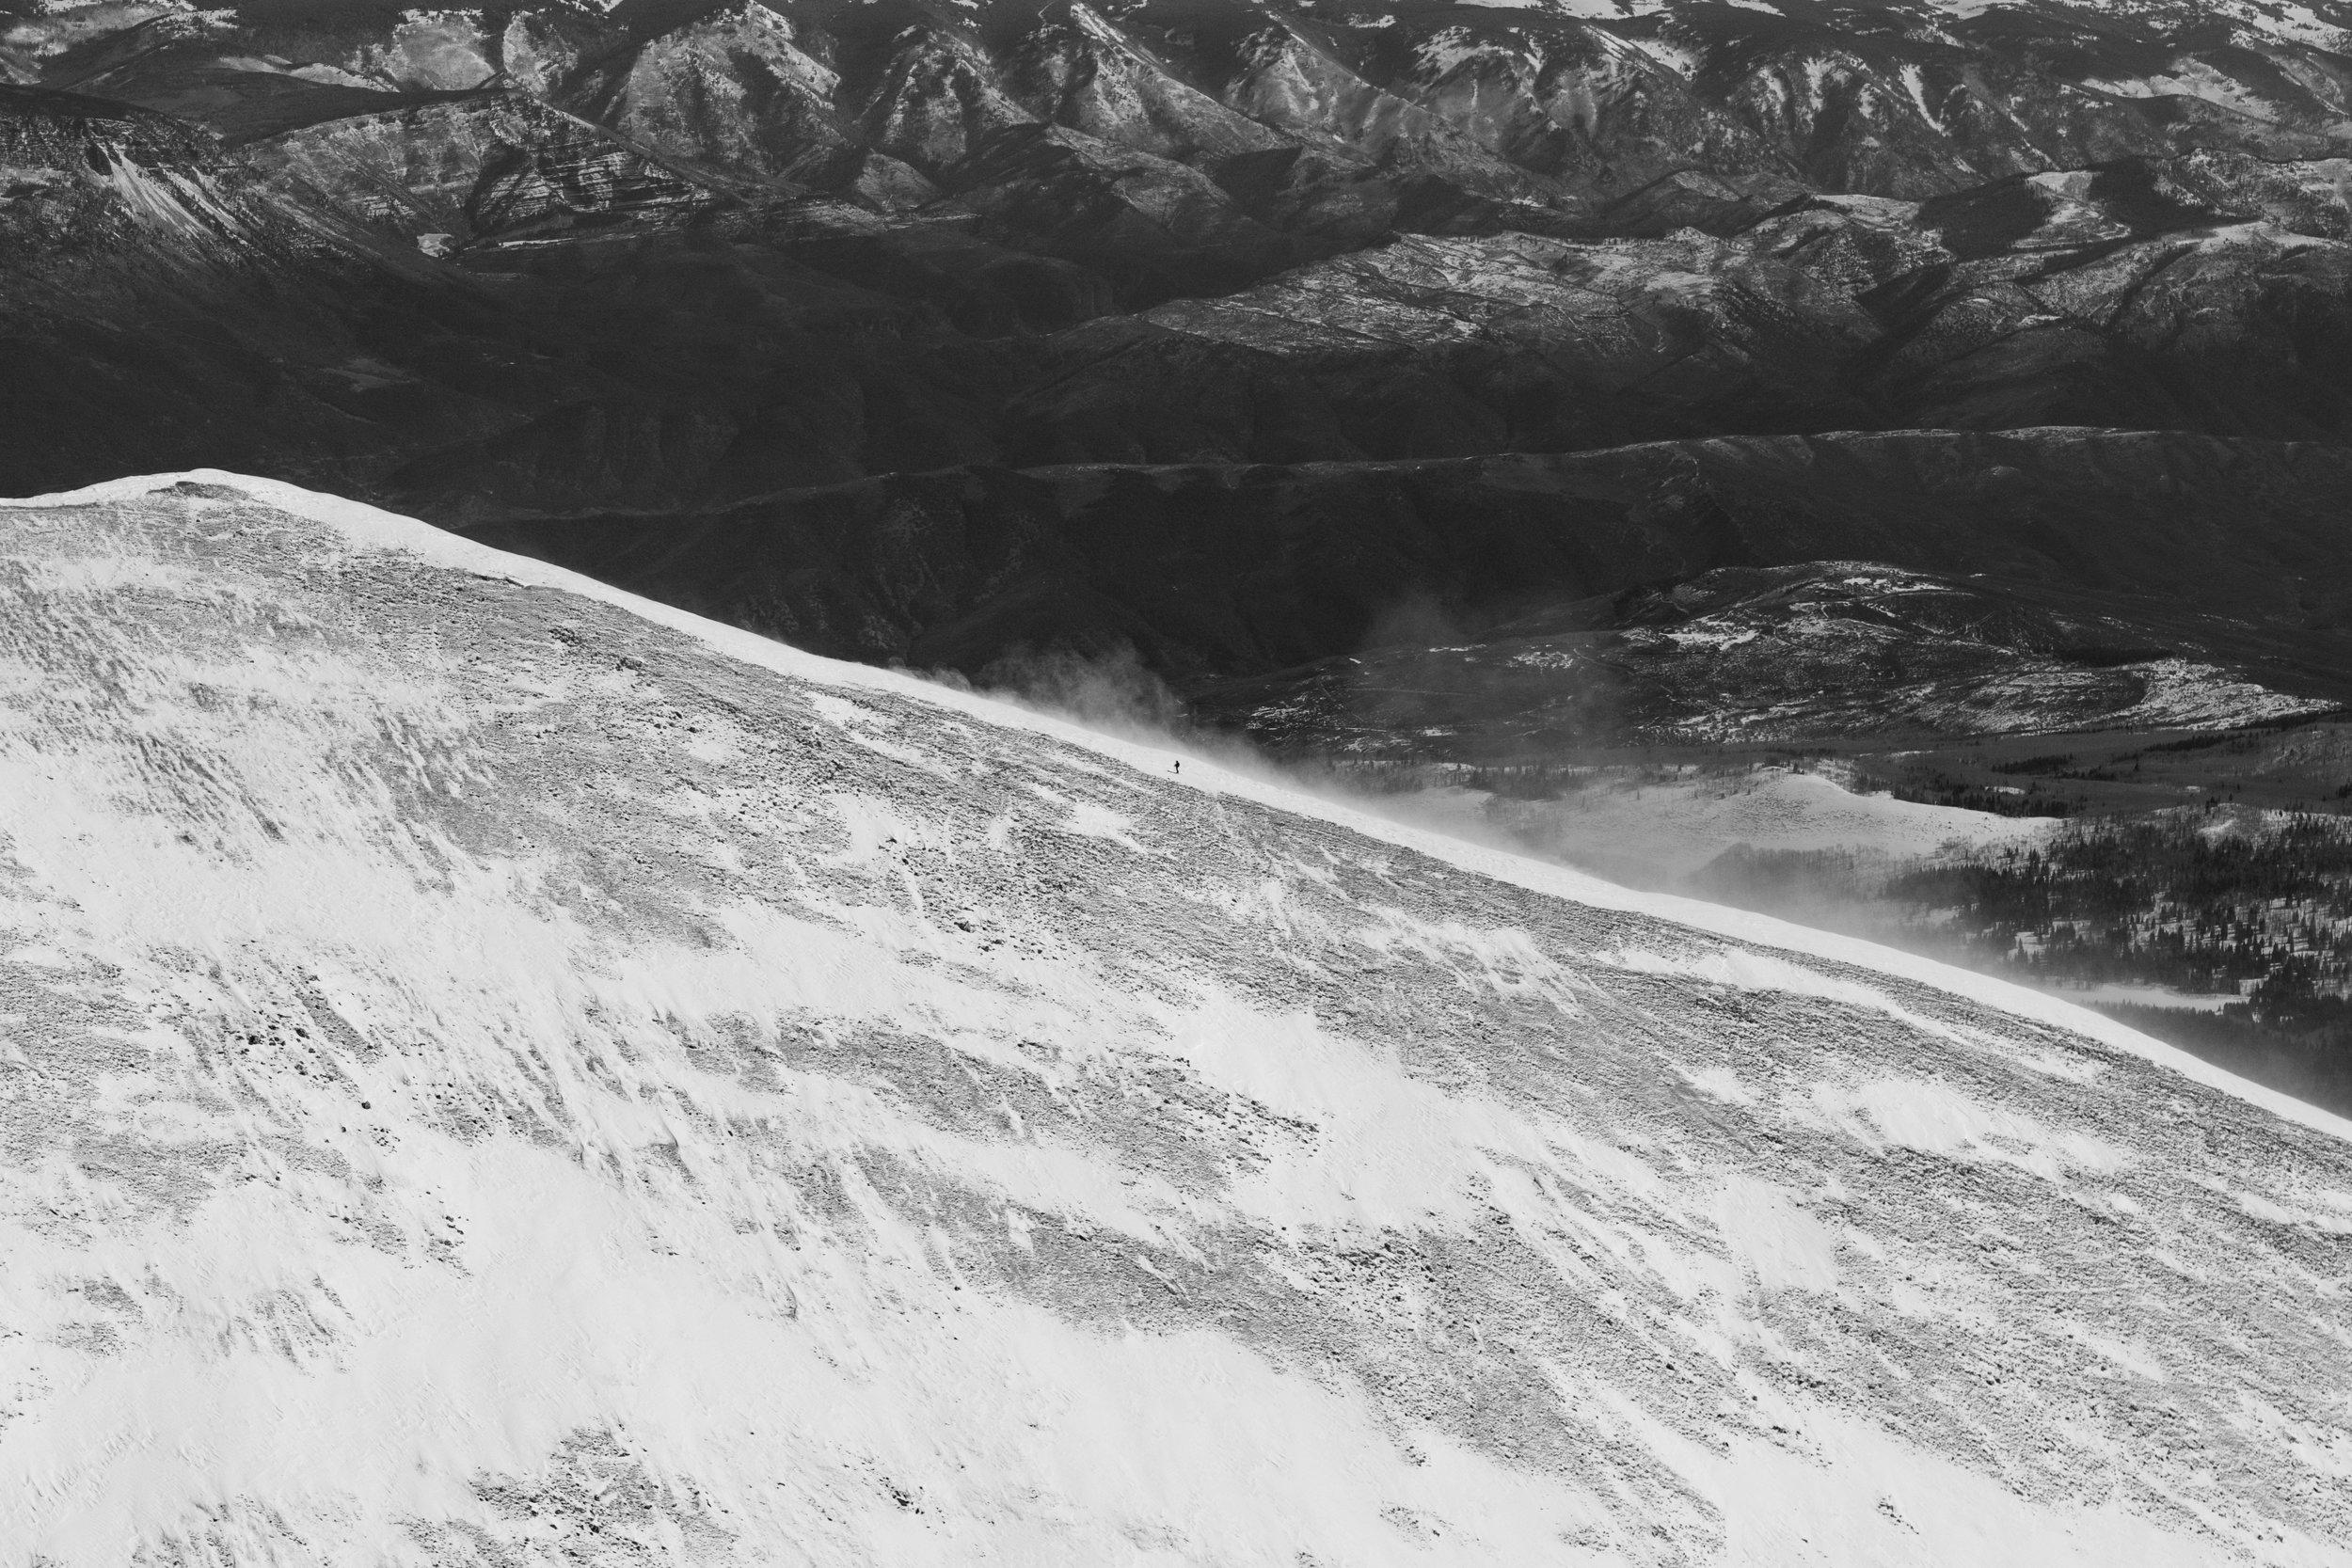 Skinning #2, Mt. Sopris